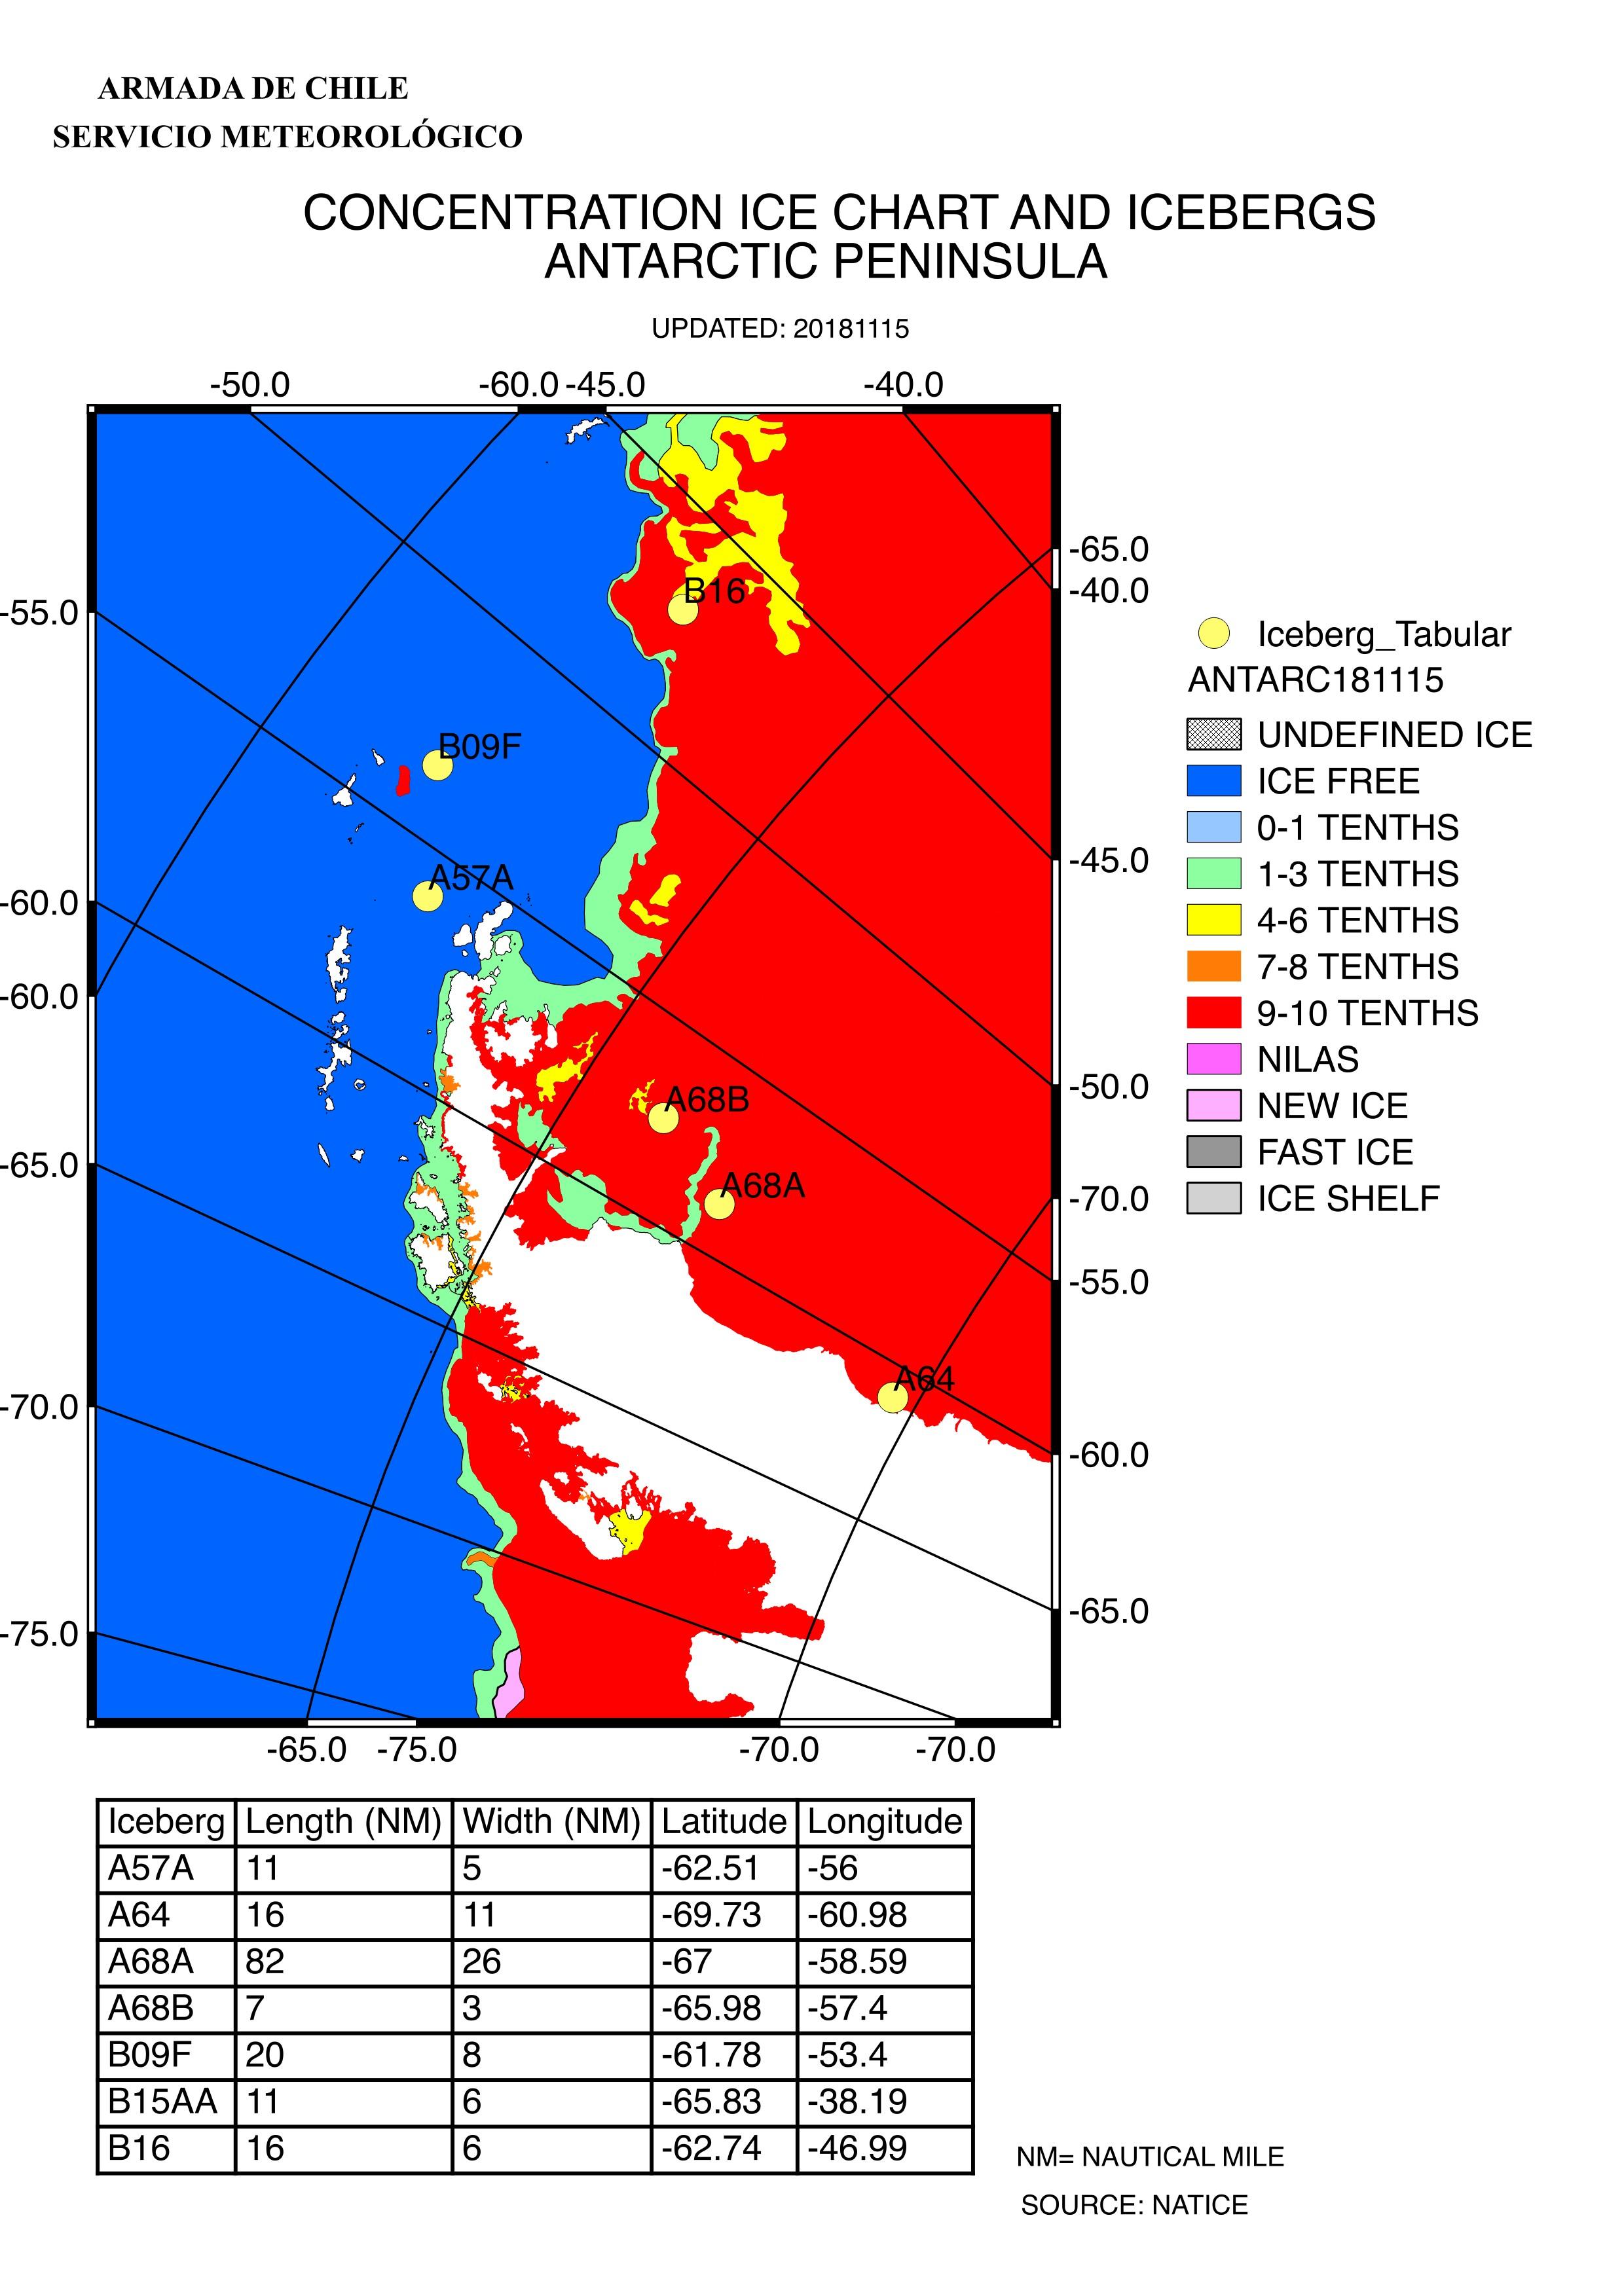 Giants icebergs monitoring